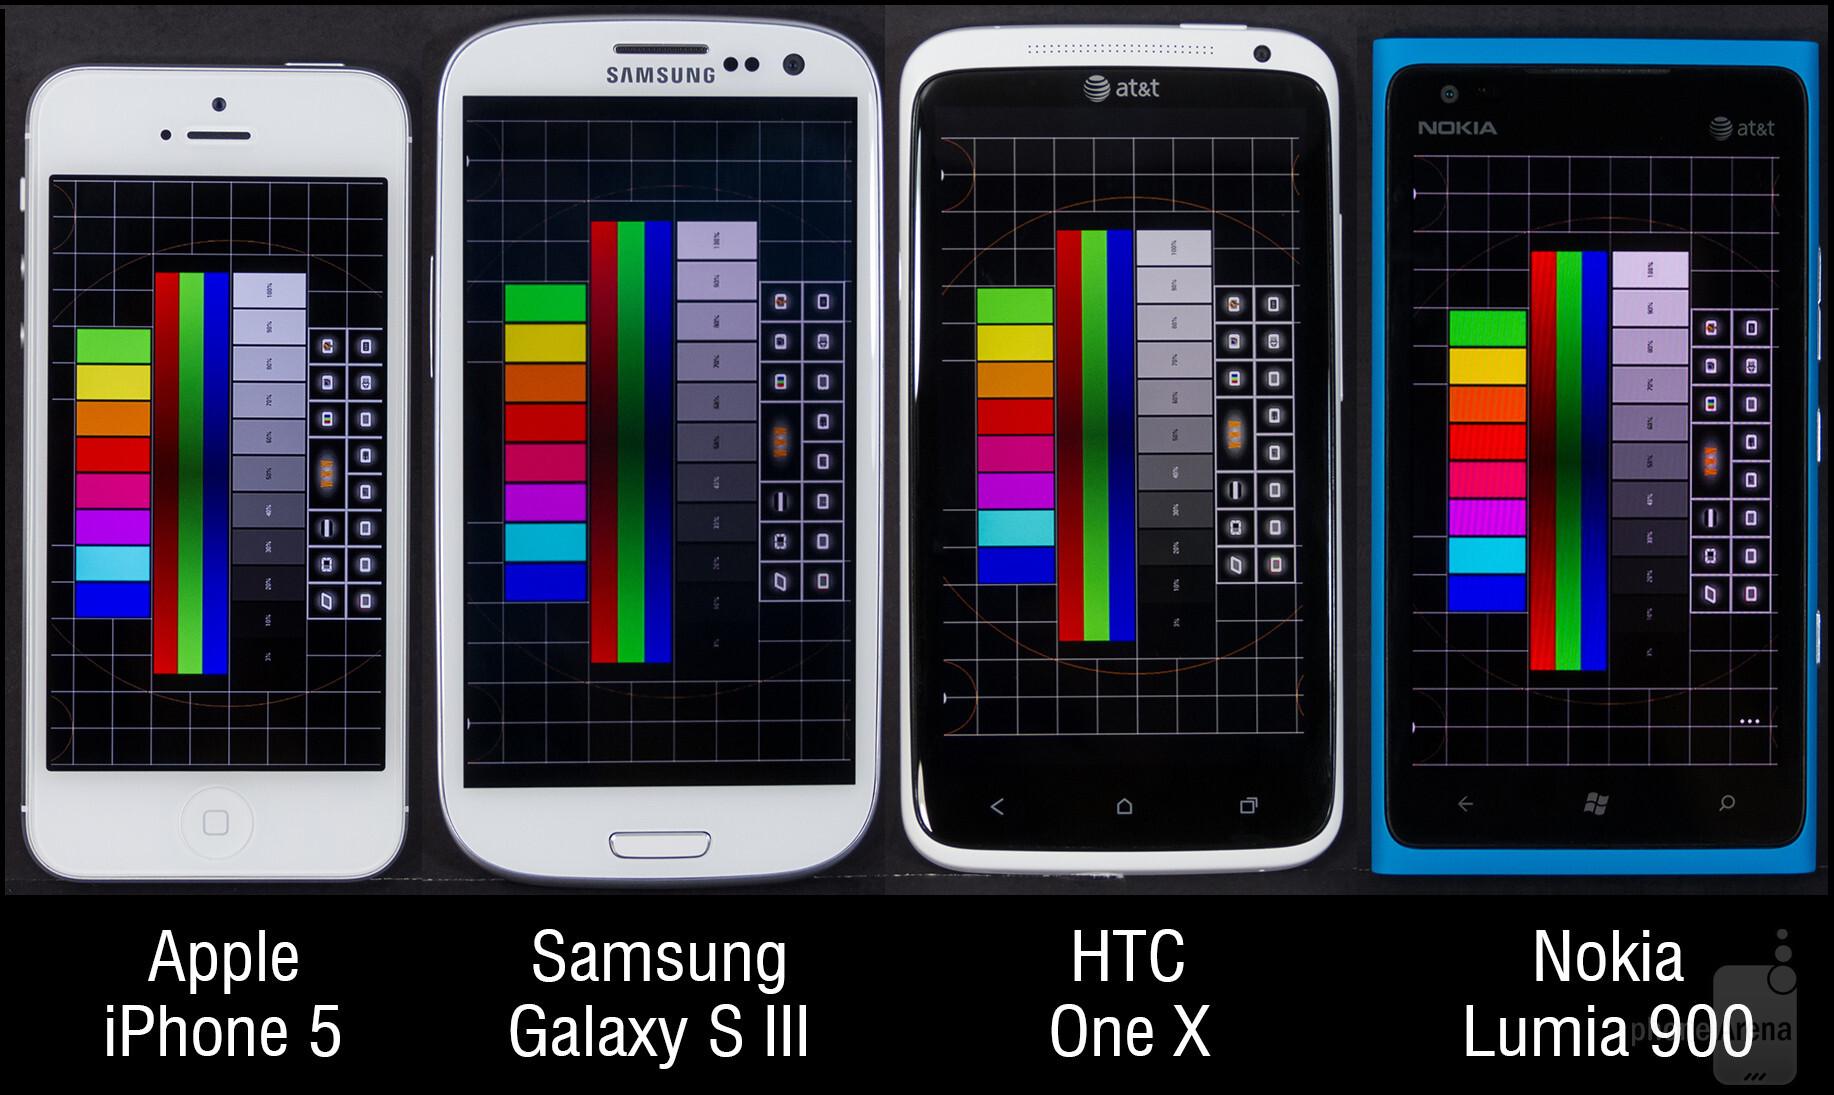 7b92a1d94d05 Display Comparison  Apple iPhone 5 vs Samsung Galaxy S III vs HTC One X vs  Nokia Lumia 900